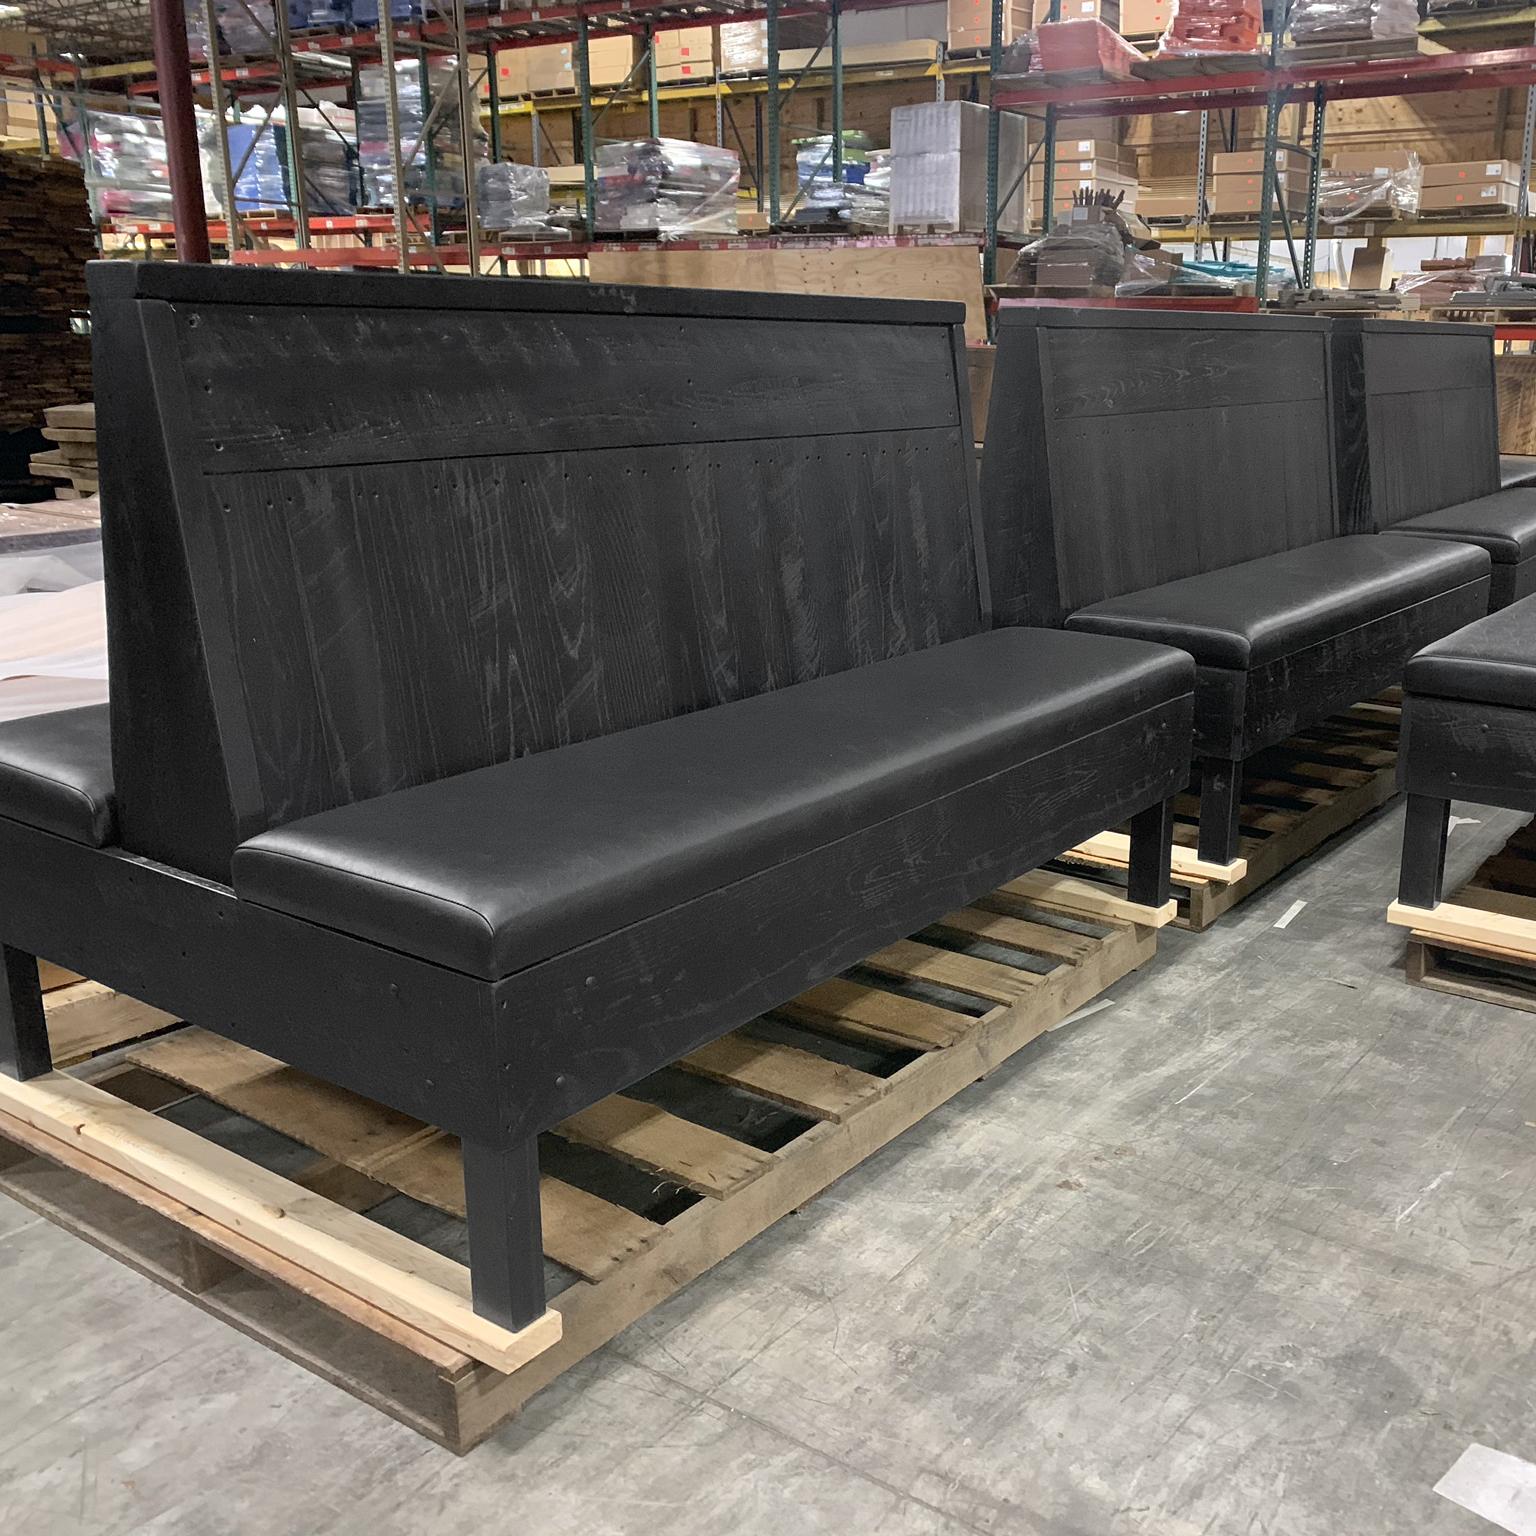 tavern-booth-ud-eby-black-vinyl-seat.jpg